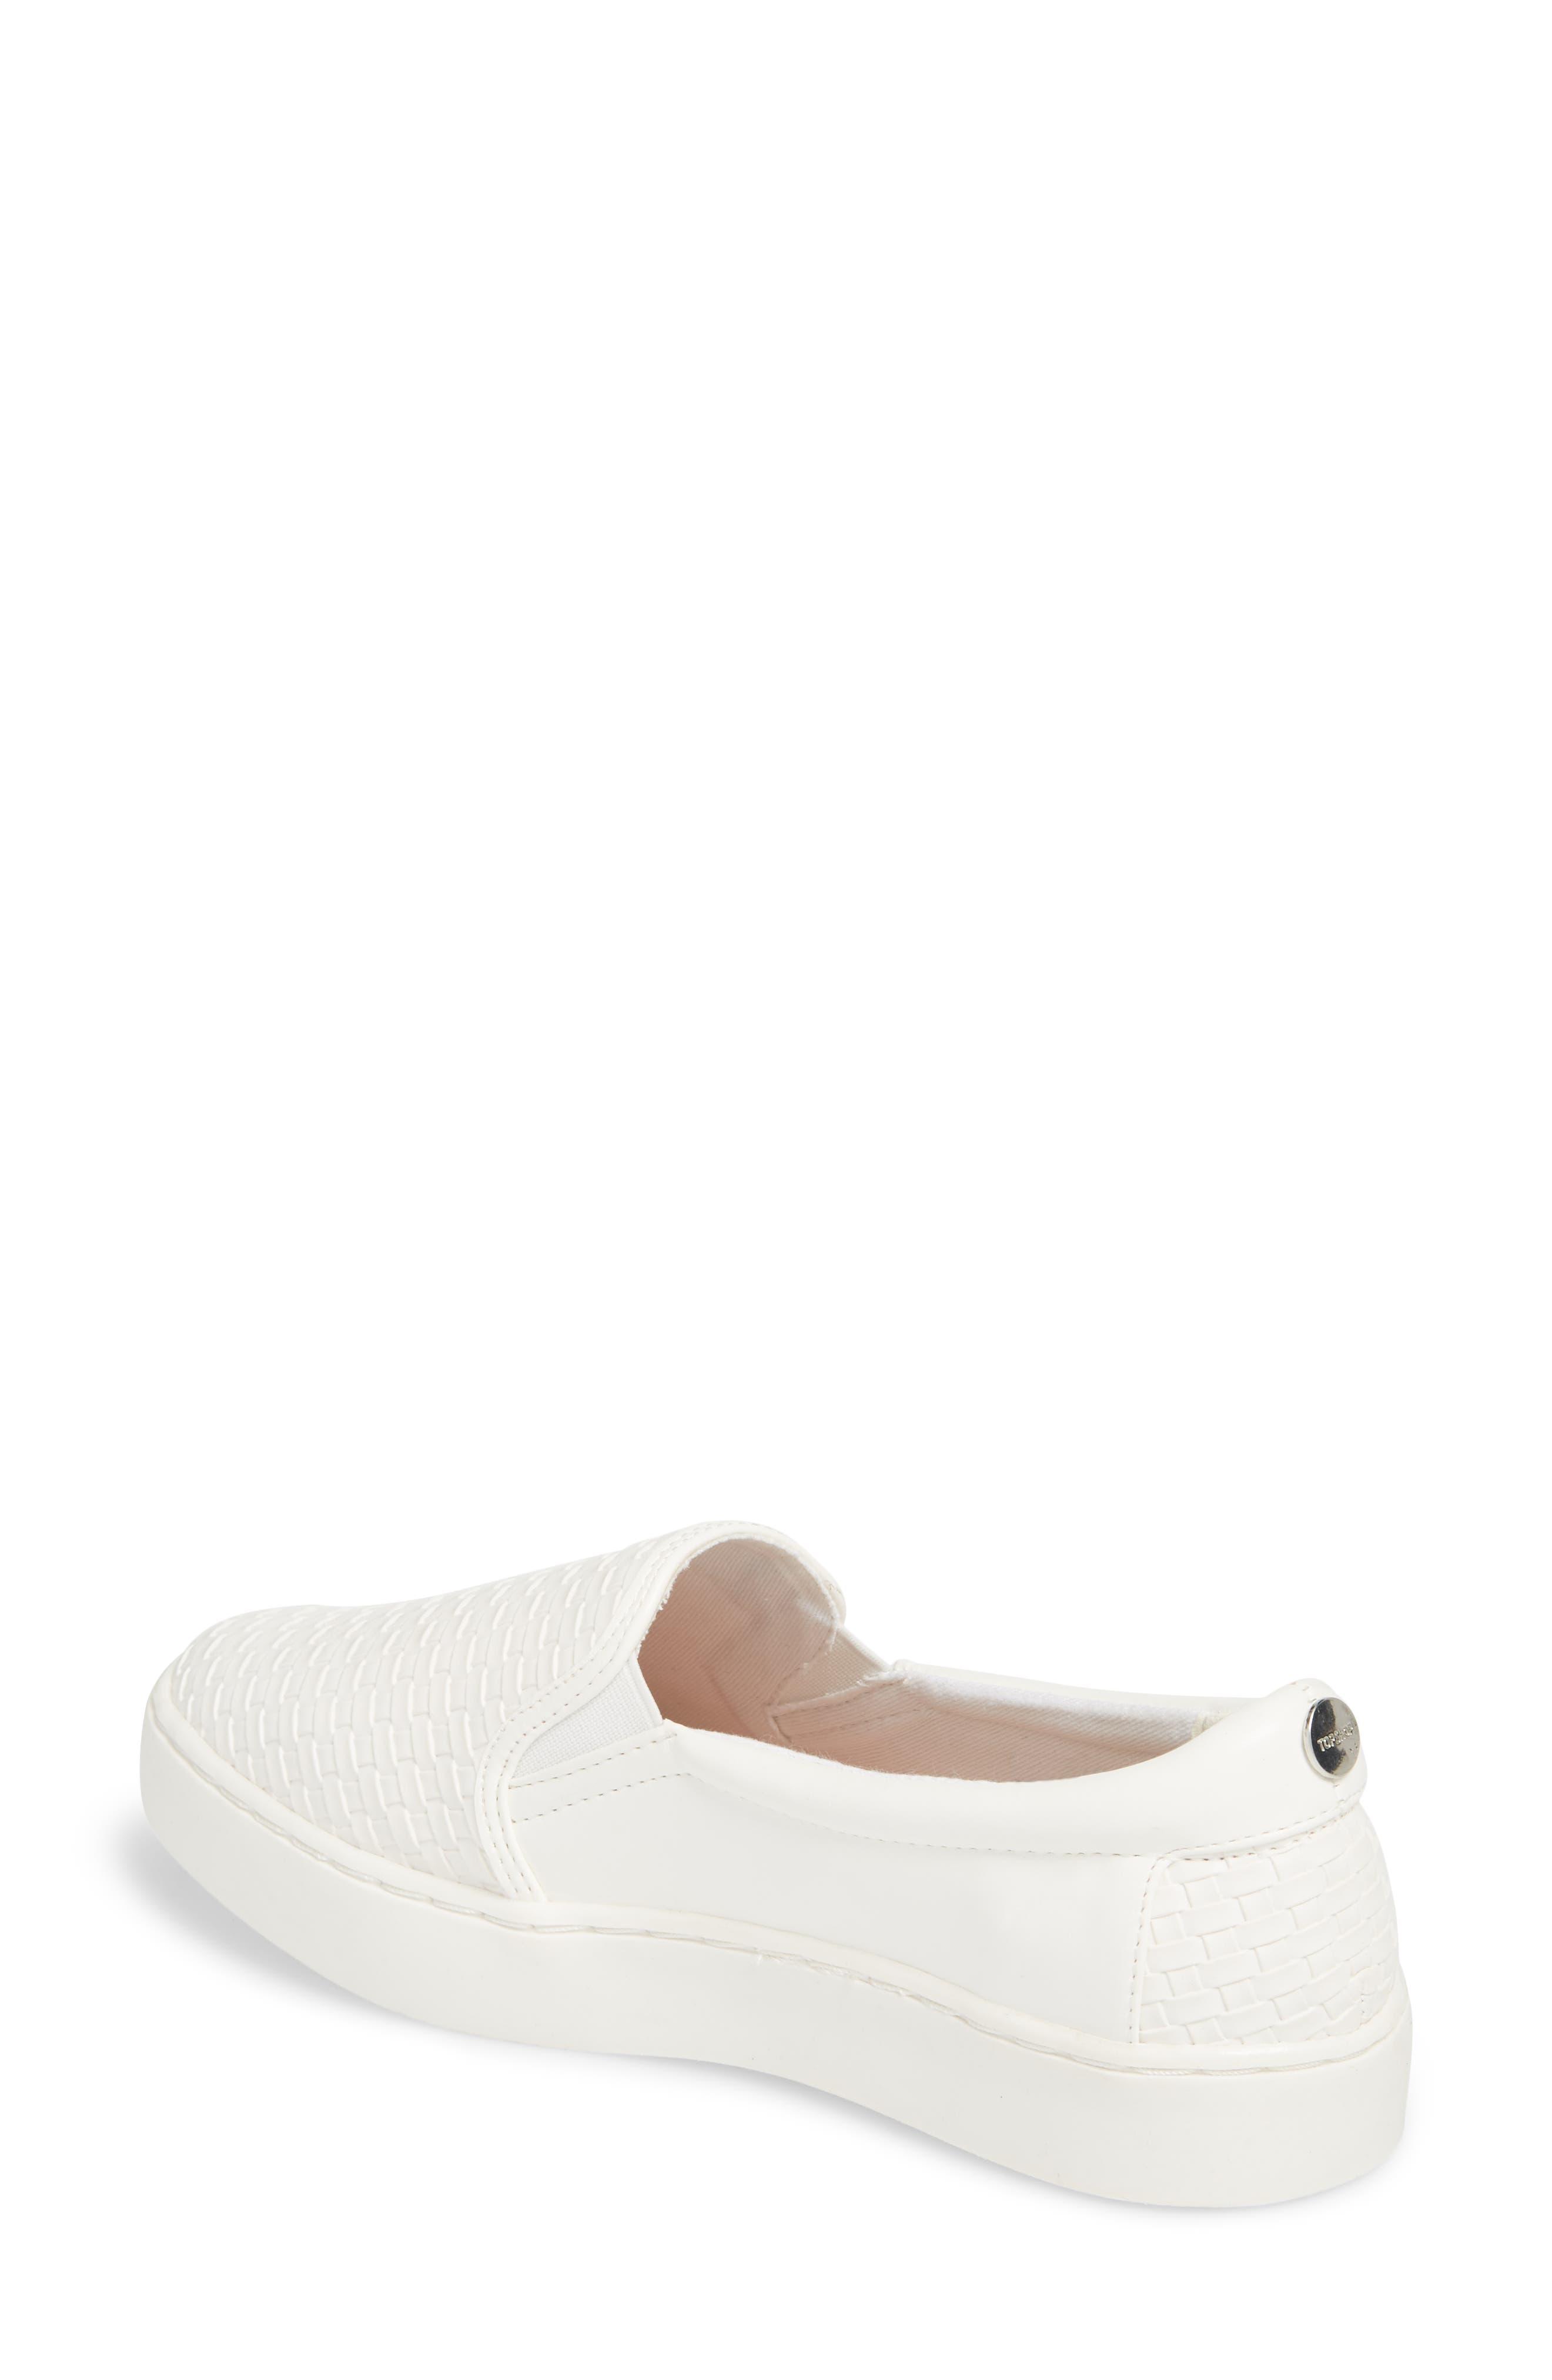 Taylor Slip-On Sport Sneakers,                             Alternate thumbnail 2, color,                             100